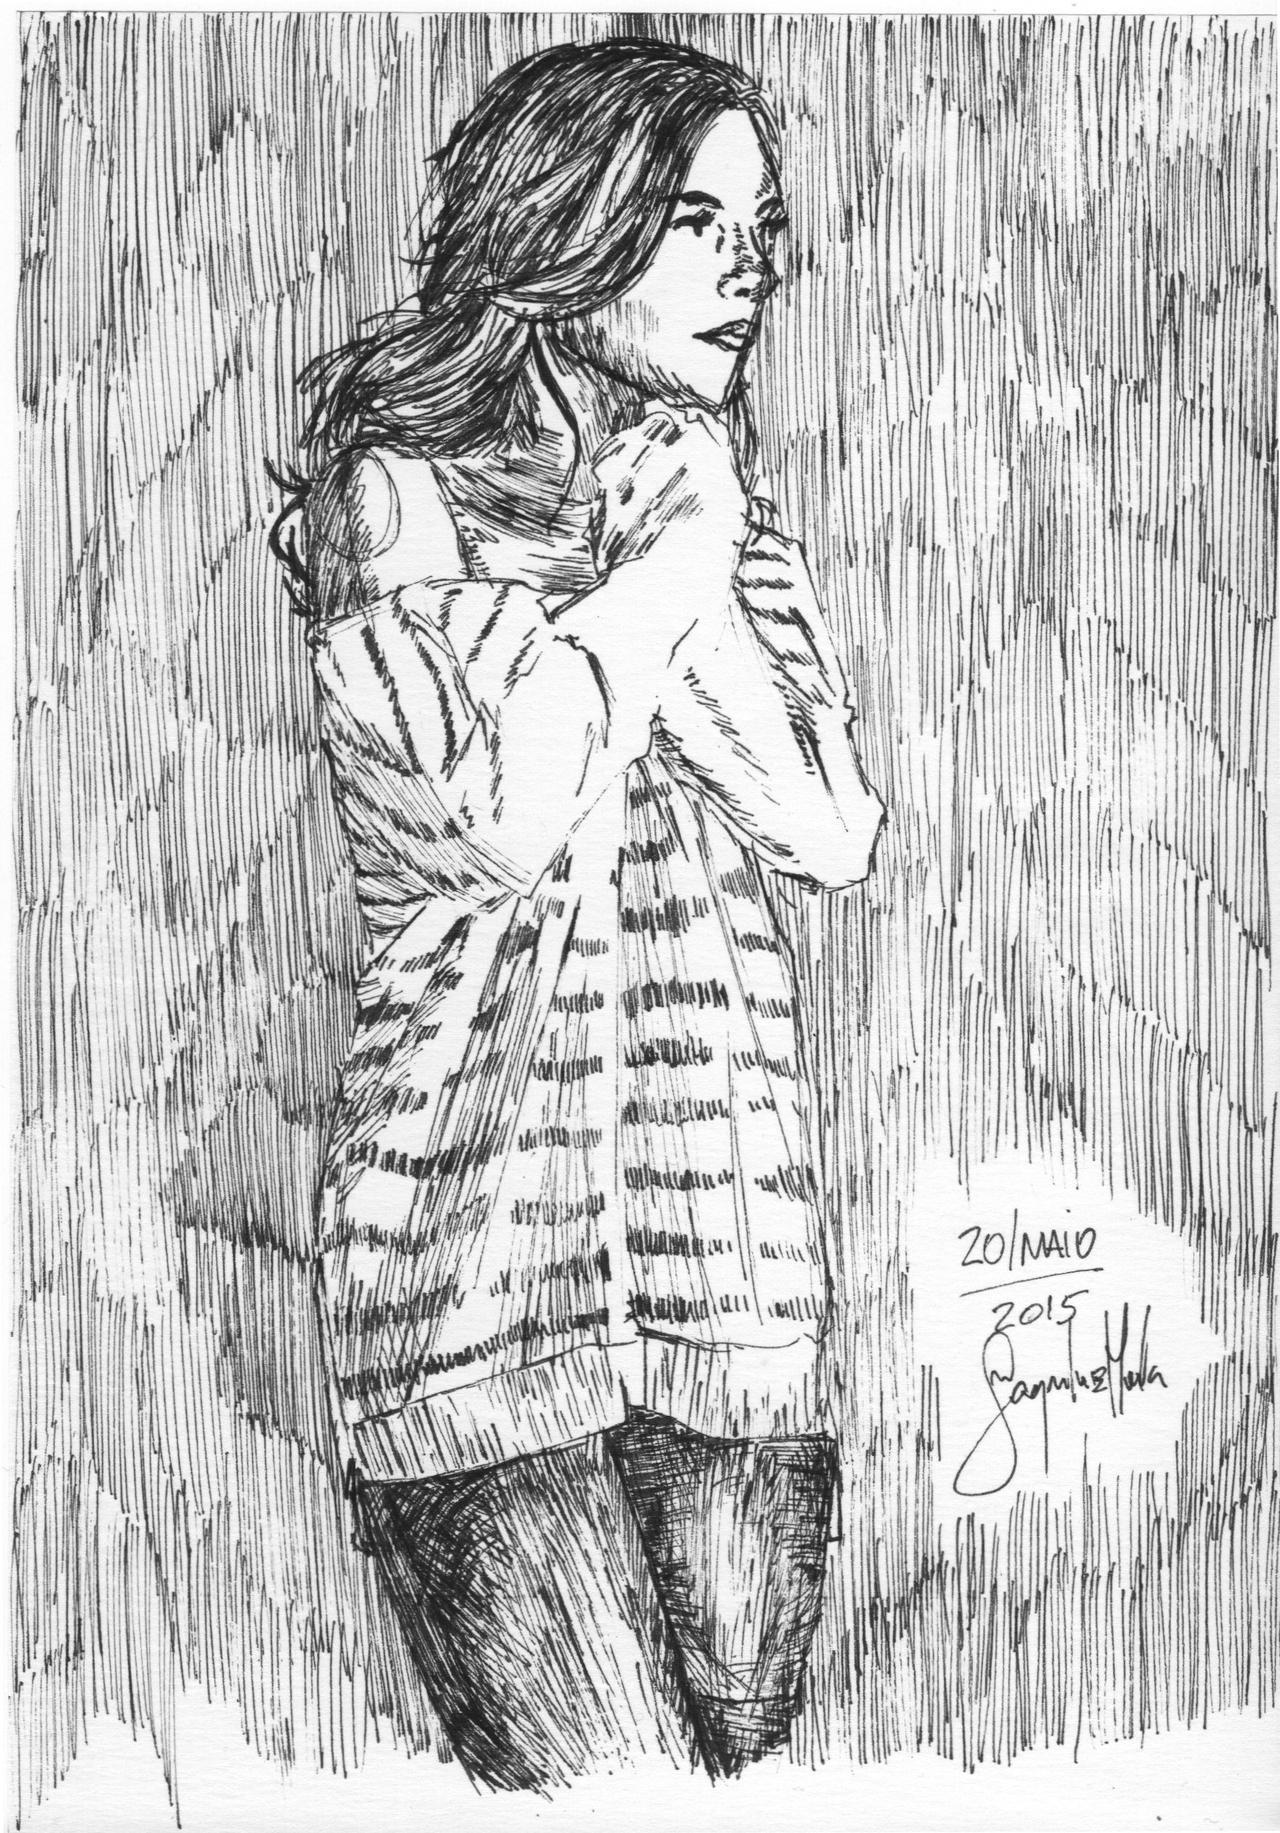 here_comes_the_rain_again_by_pyatan-d8u4